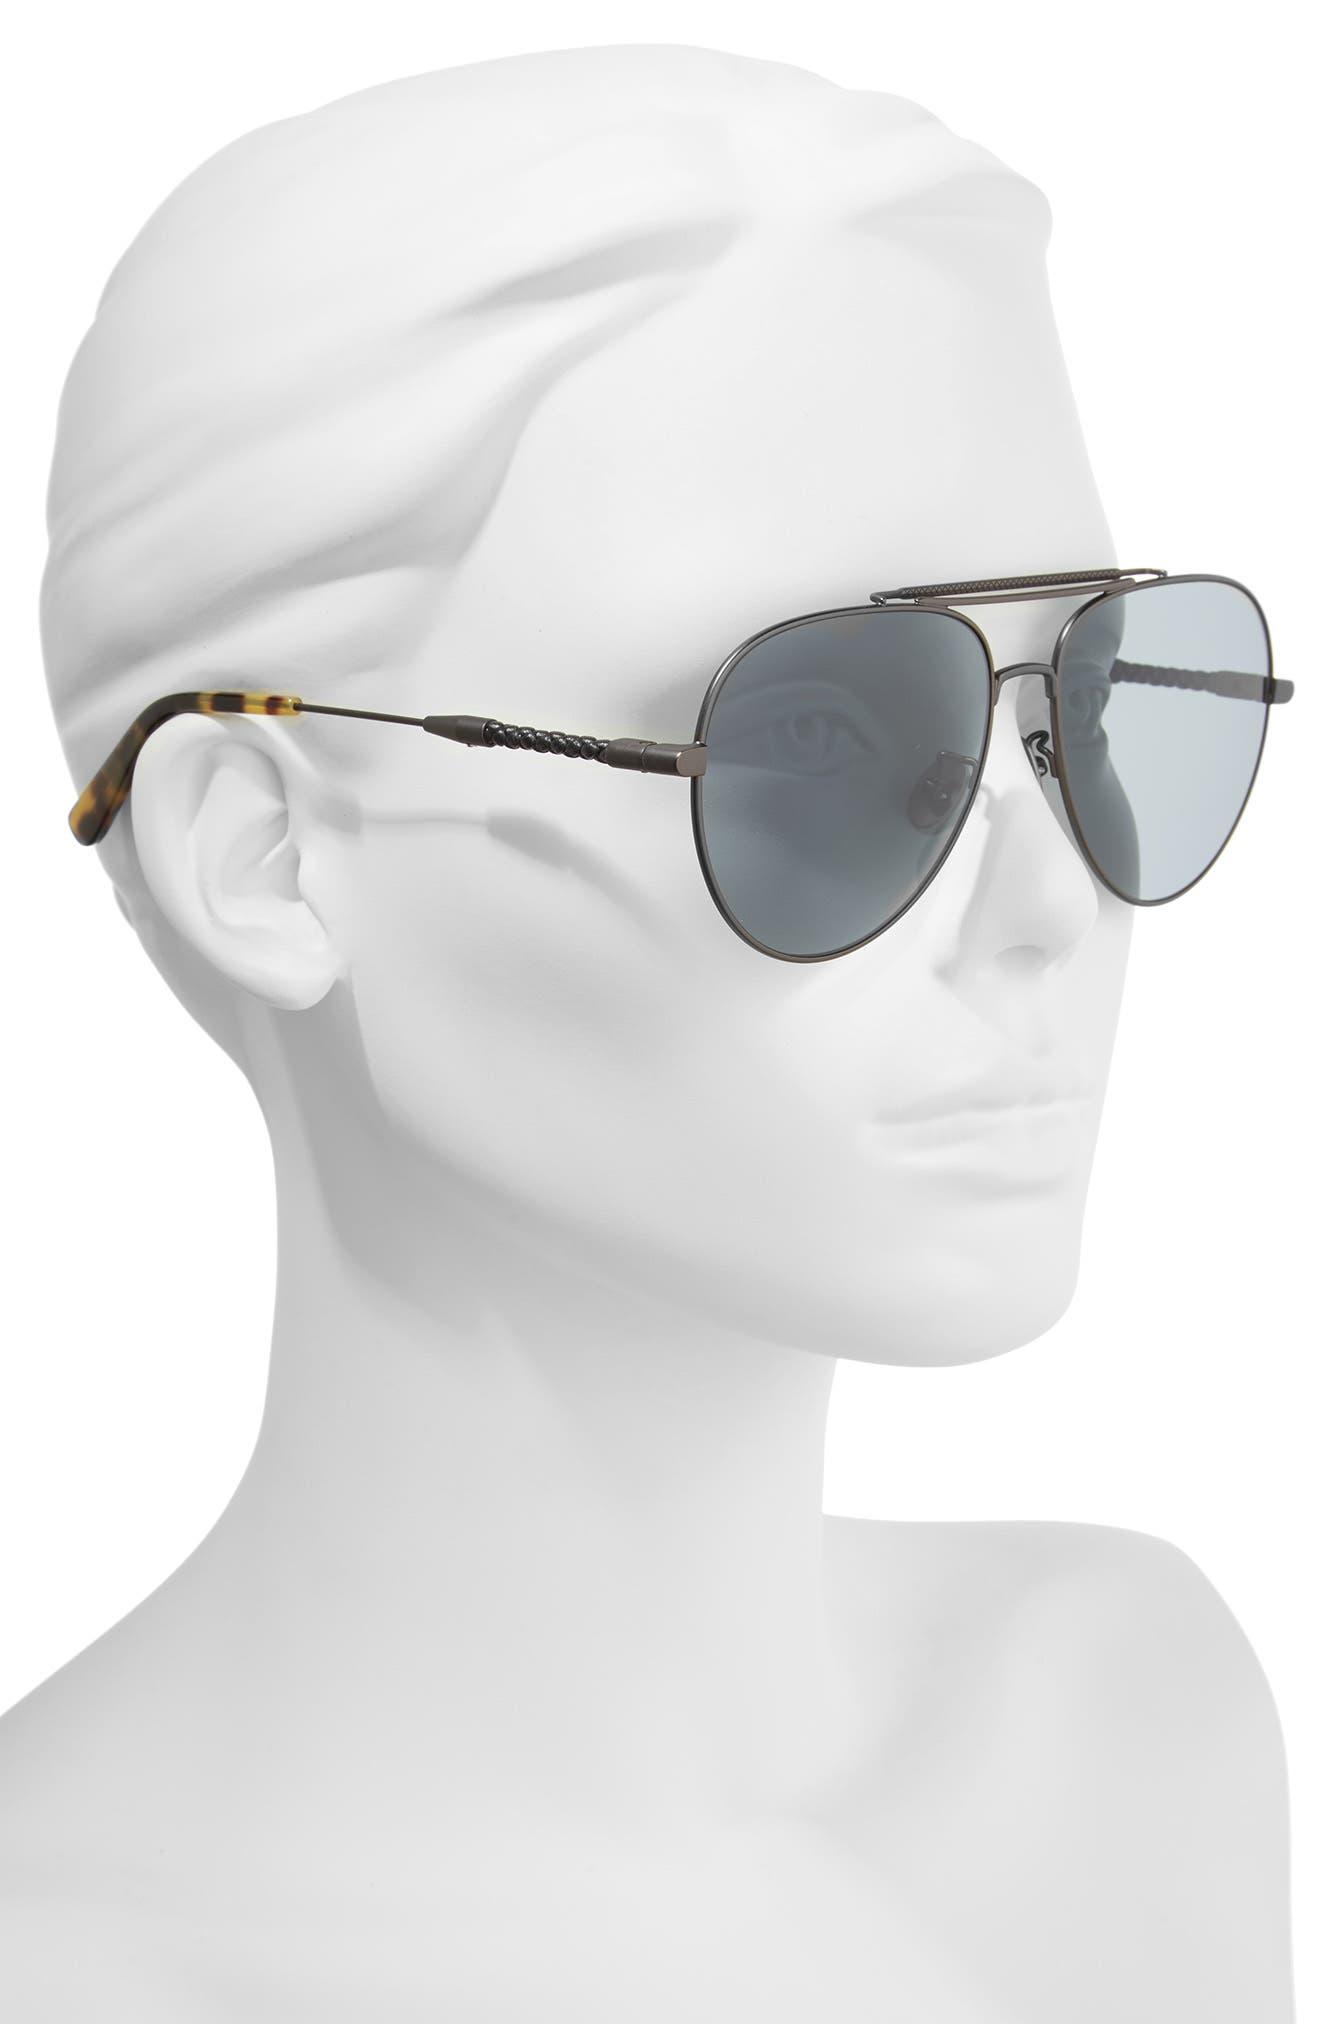 59m Polarized Aviator Sunglasses,                             Alternate thumbnail 2, color,                             Ruthenium